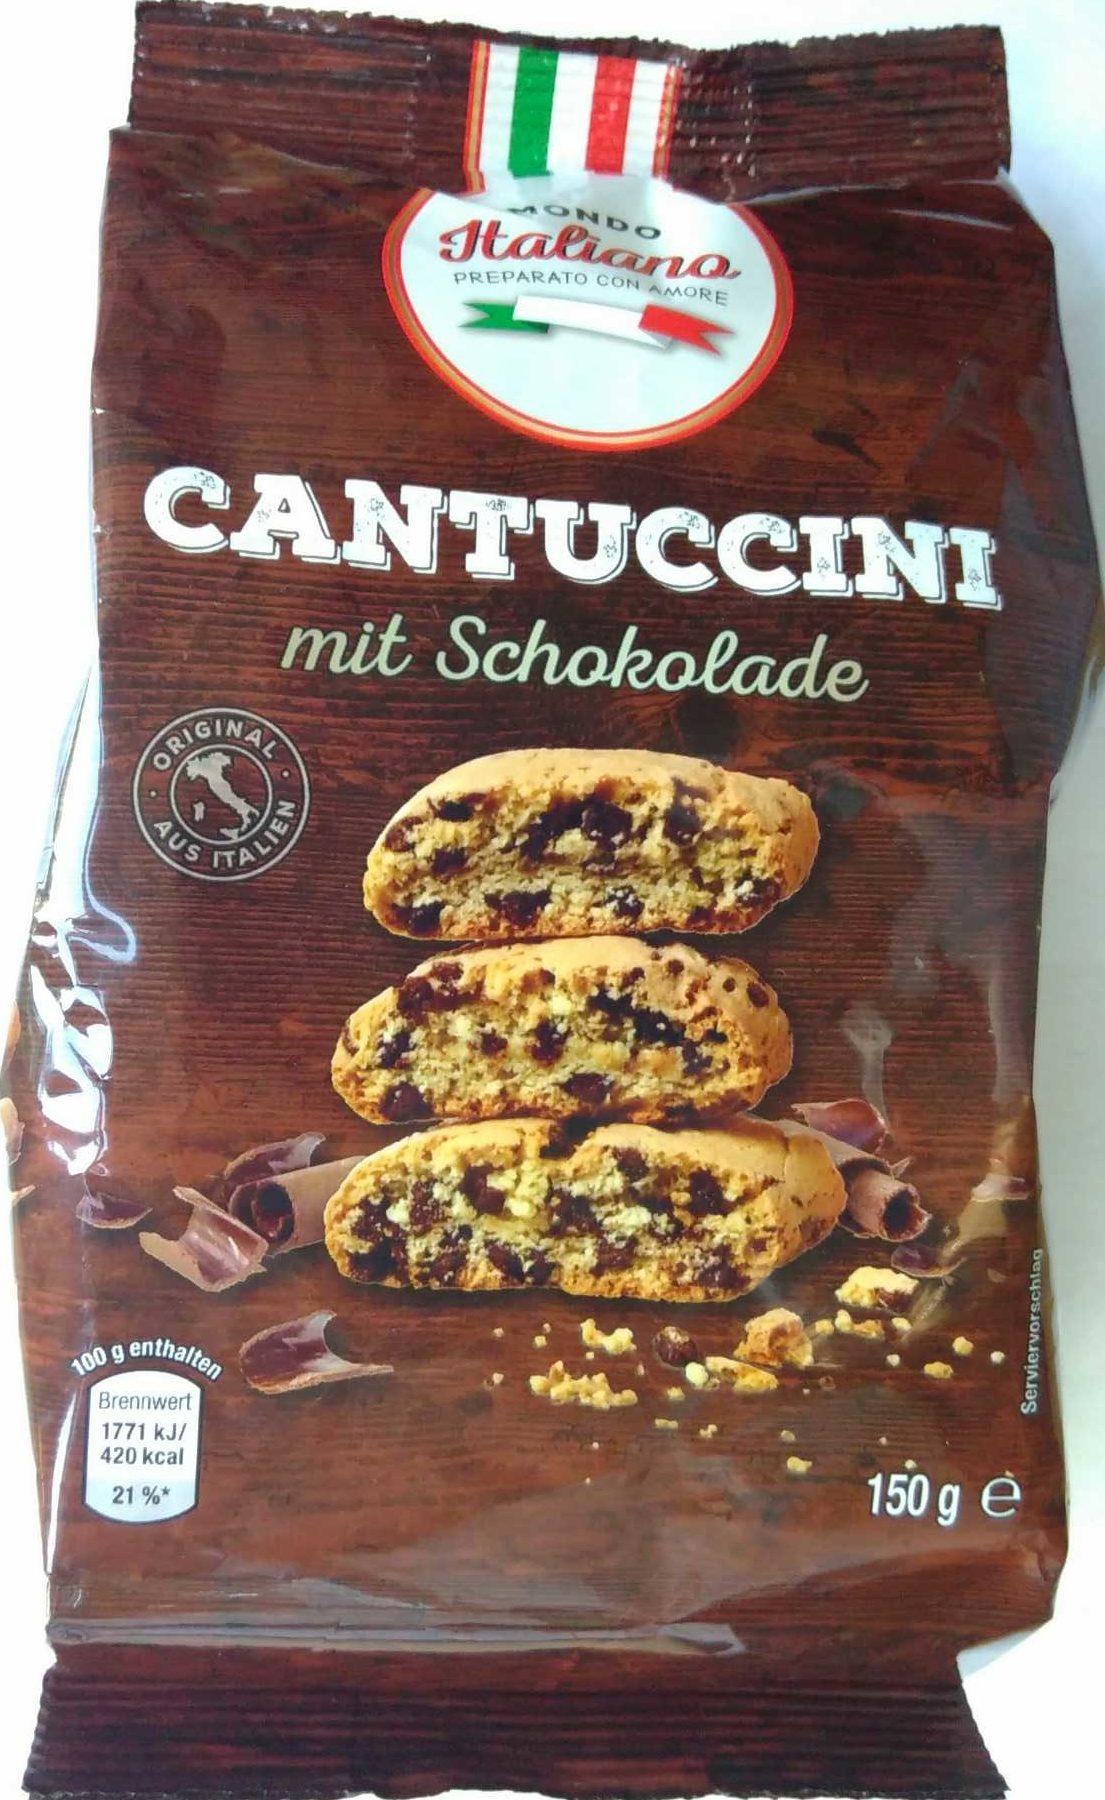 Cantuccini mit Schokolade - Produkt